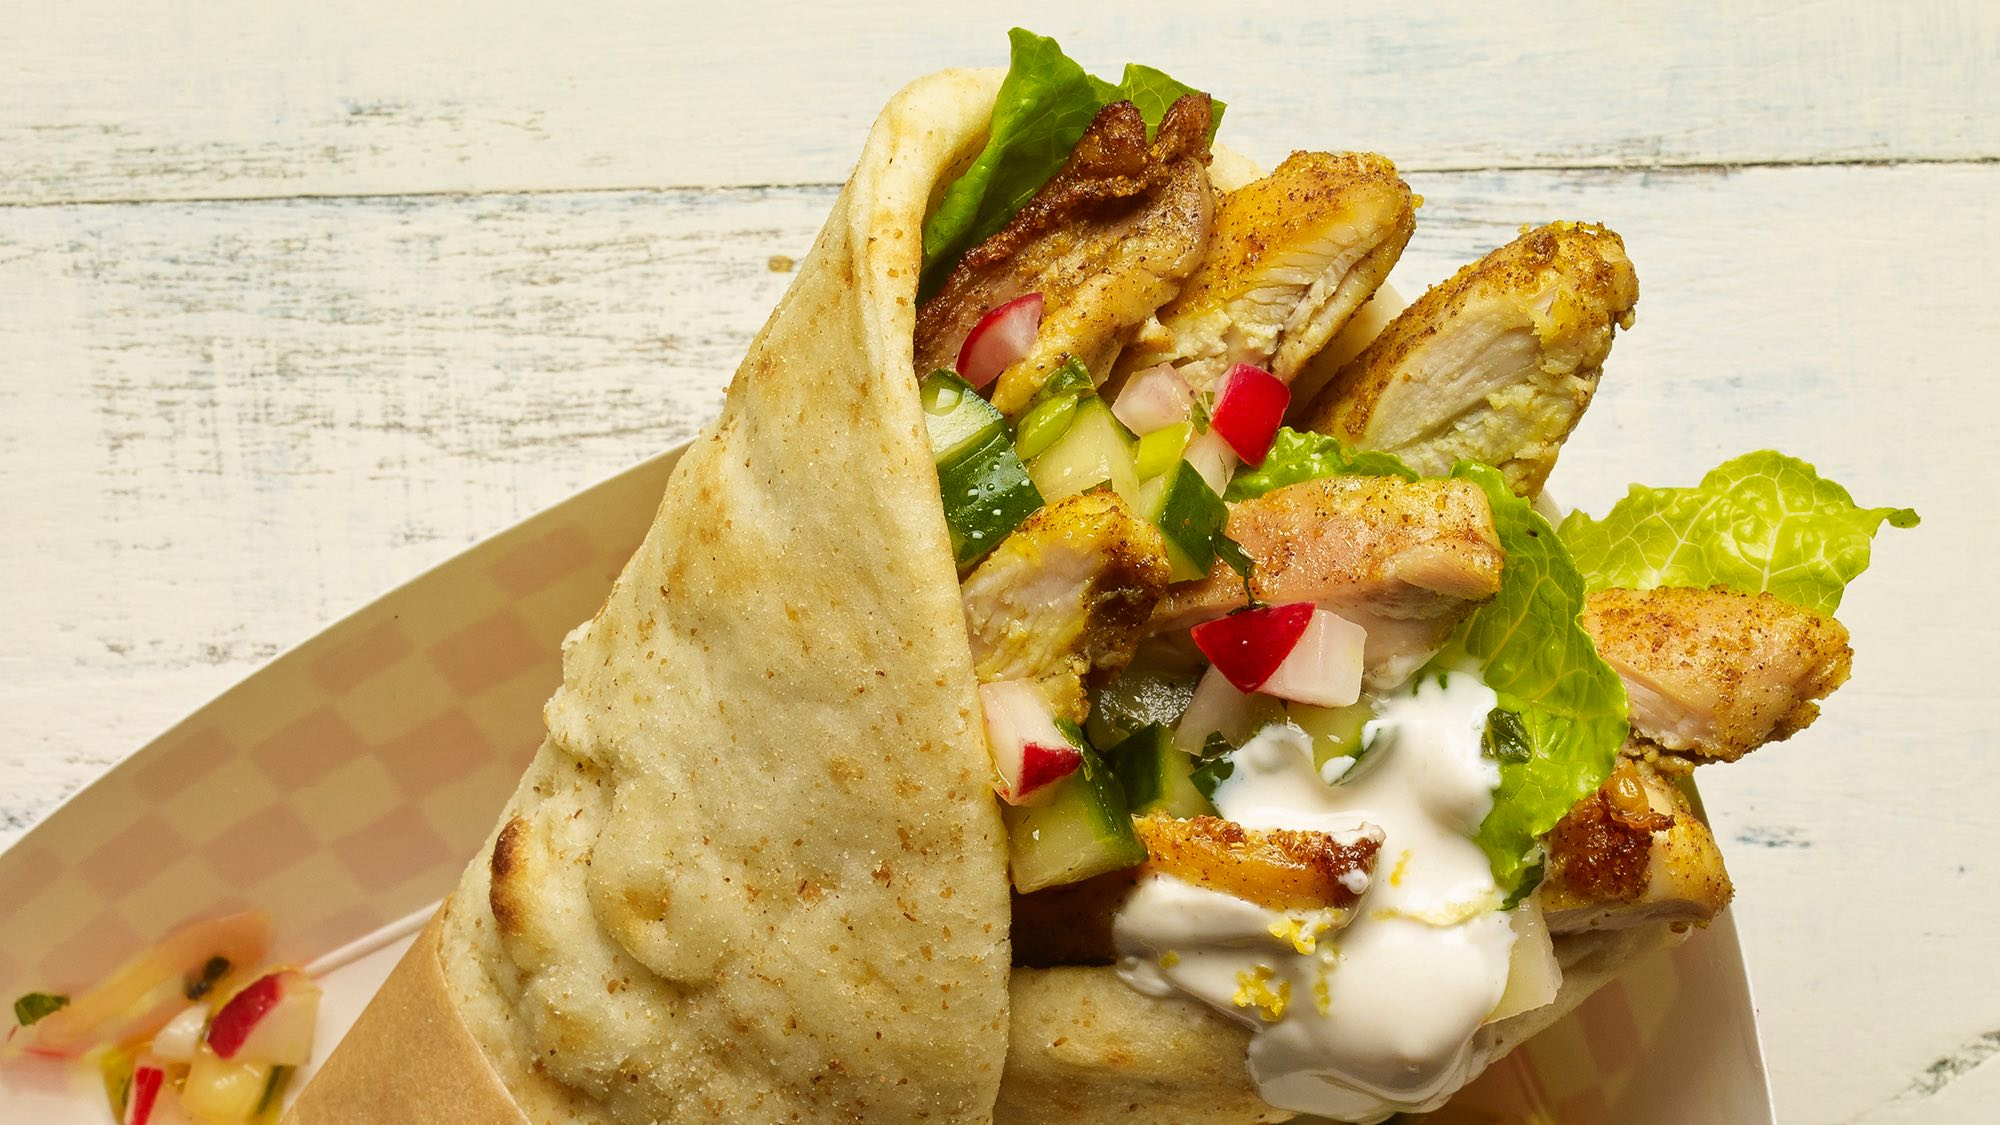 McCchicken Chicken Shawarma Wrap with Cucumber Radish Relish